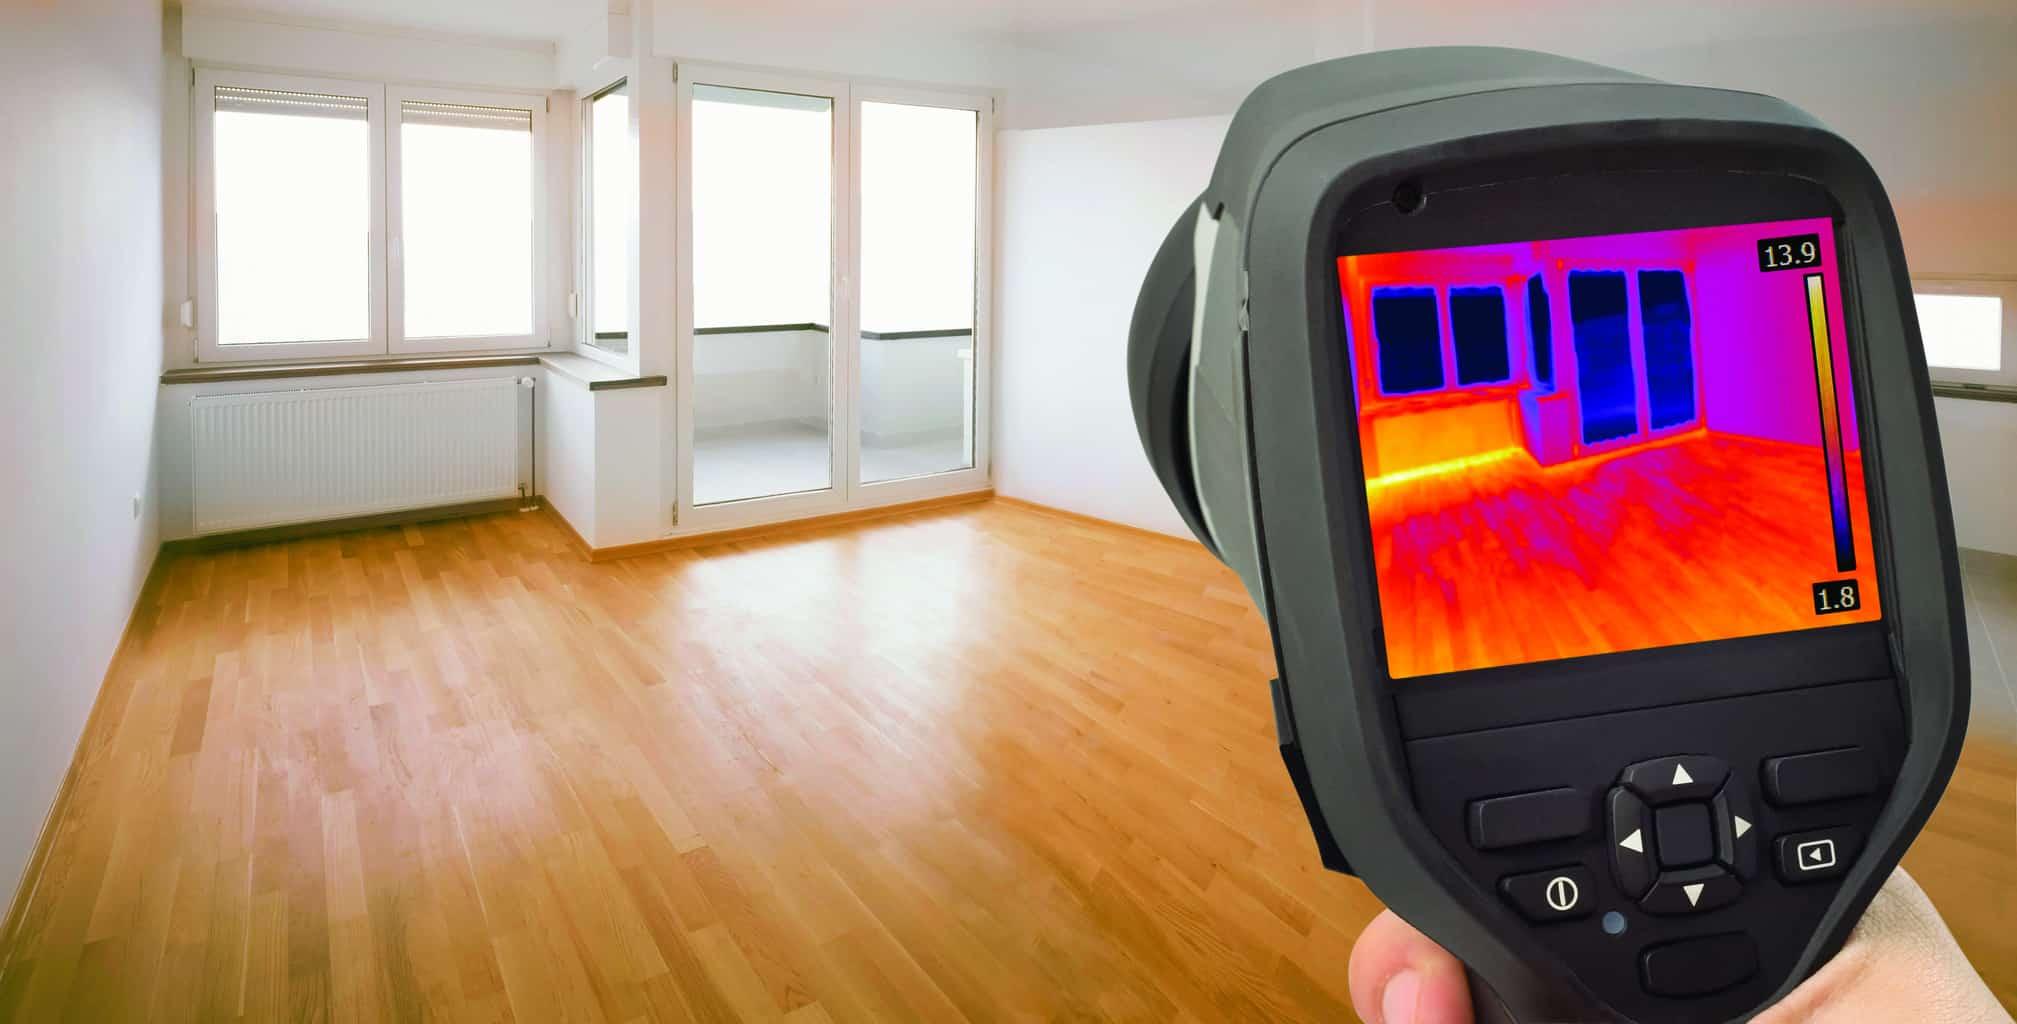 Thermal Image of Heat Leak thru Windows